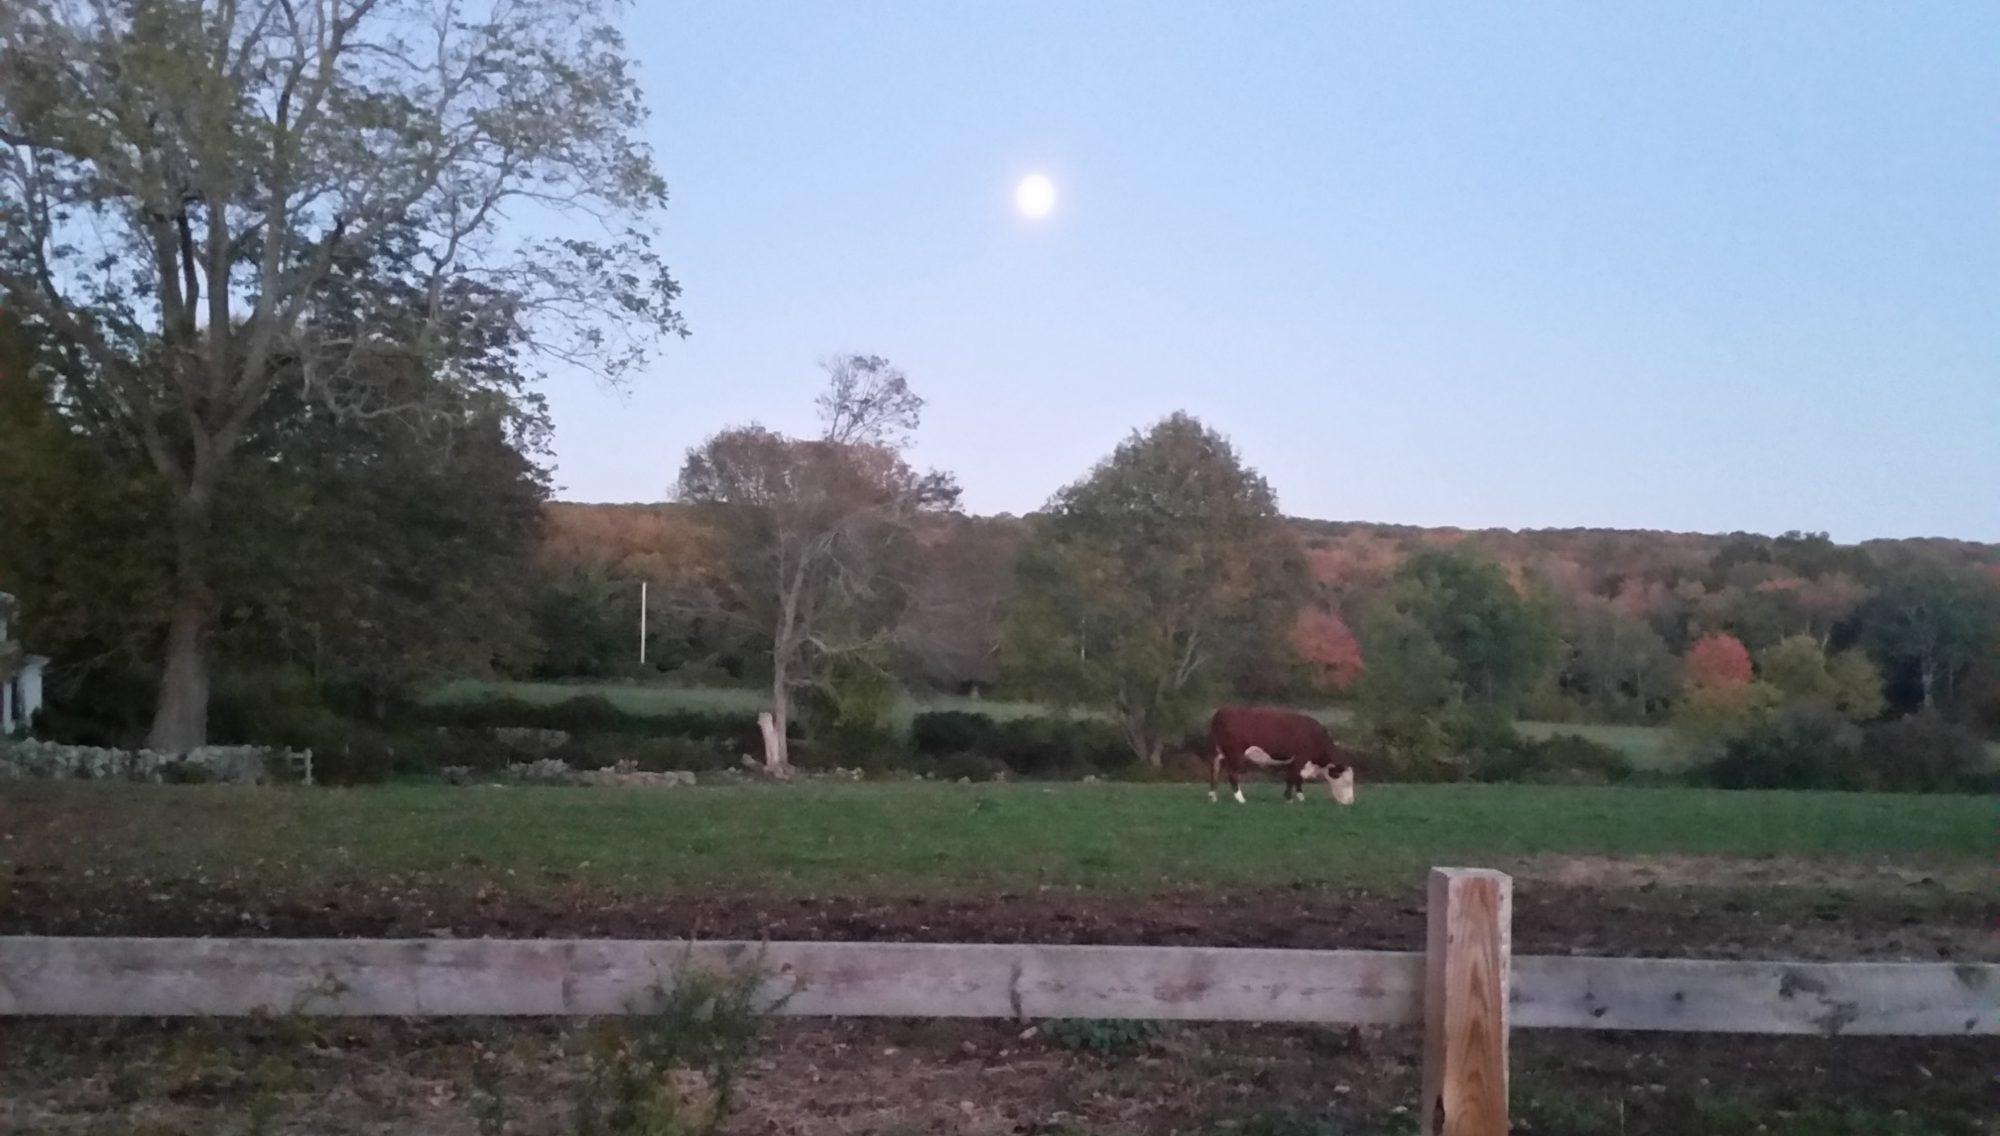 Russet Valley Farm